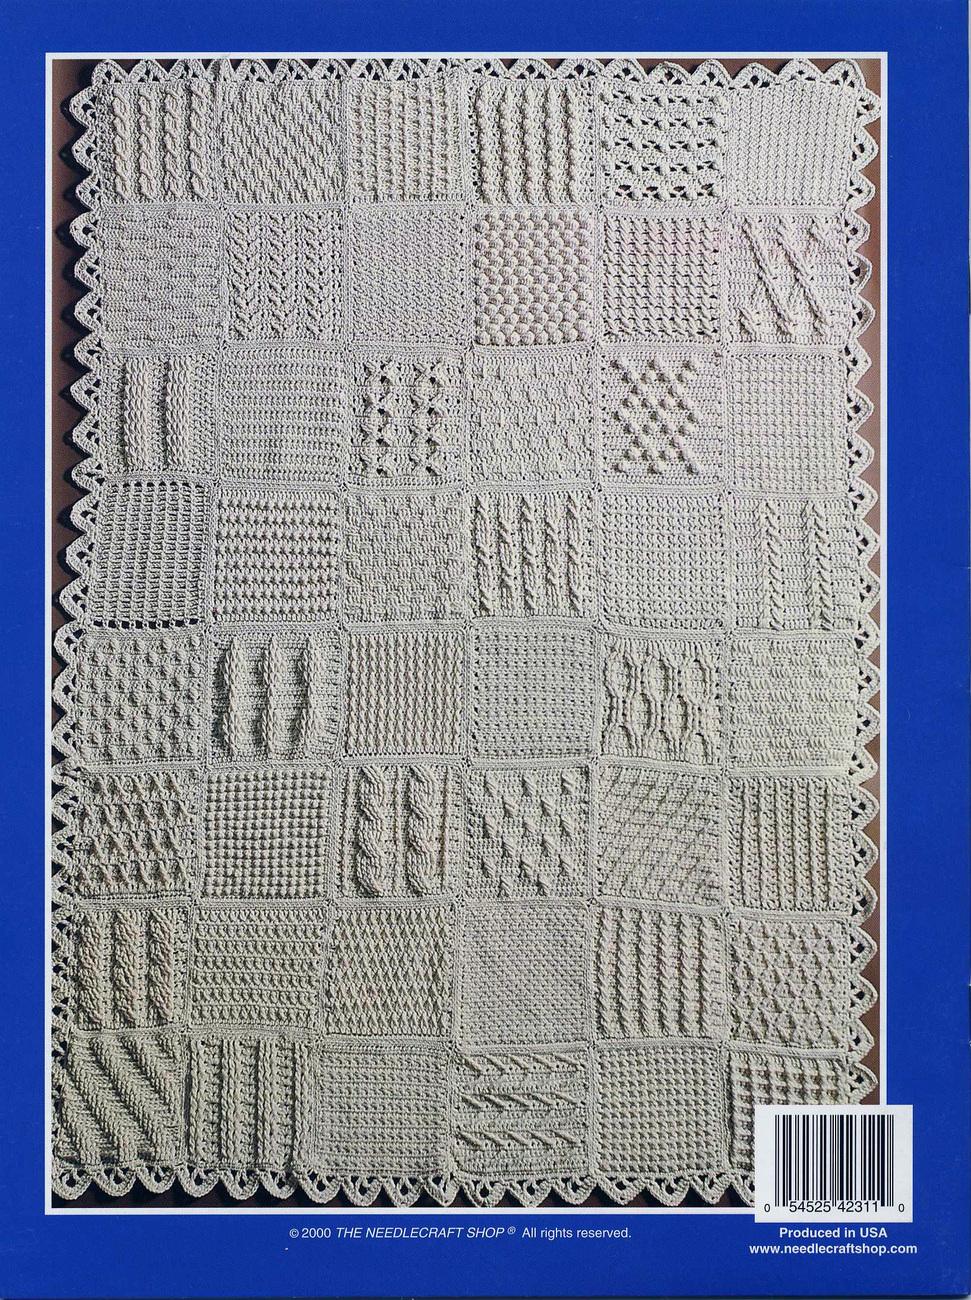 Crochet Pattern Book: Crochet Aran Sampler and 32 similar items